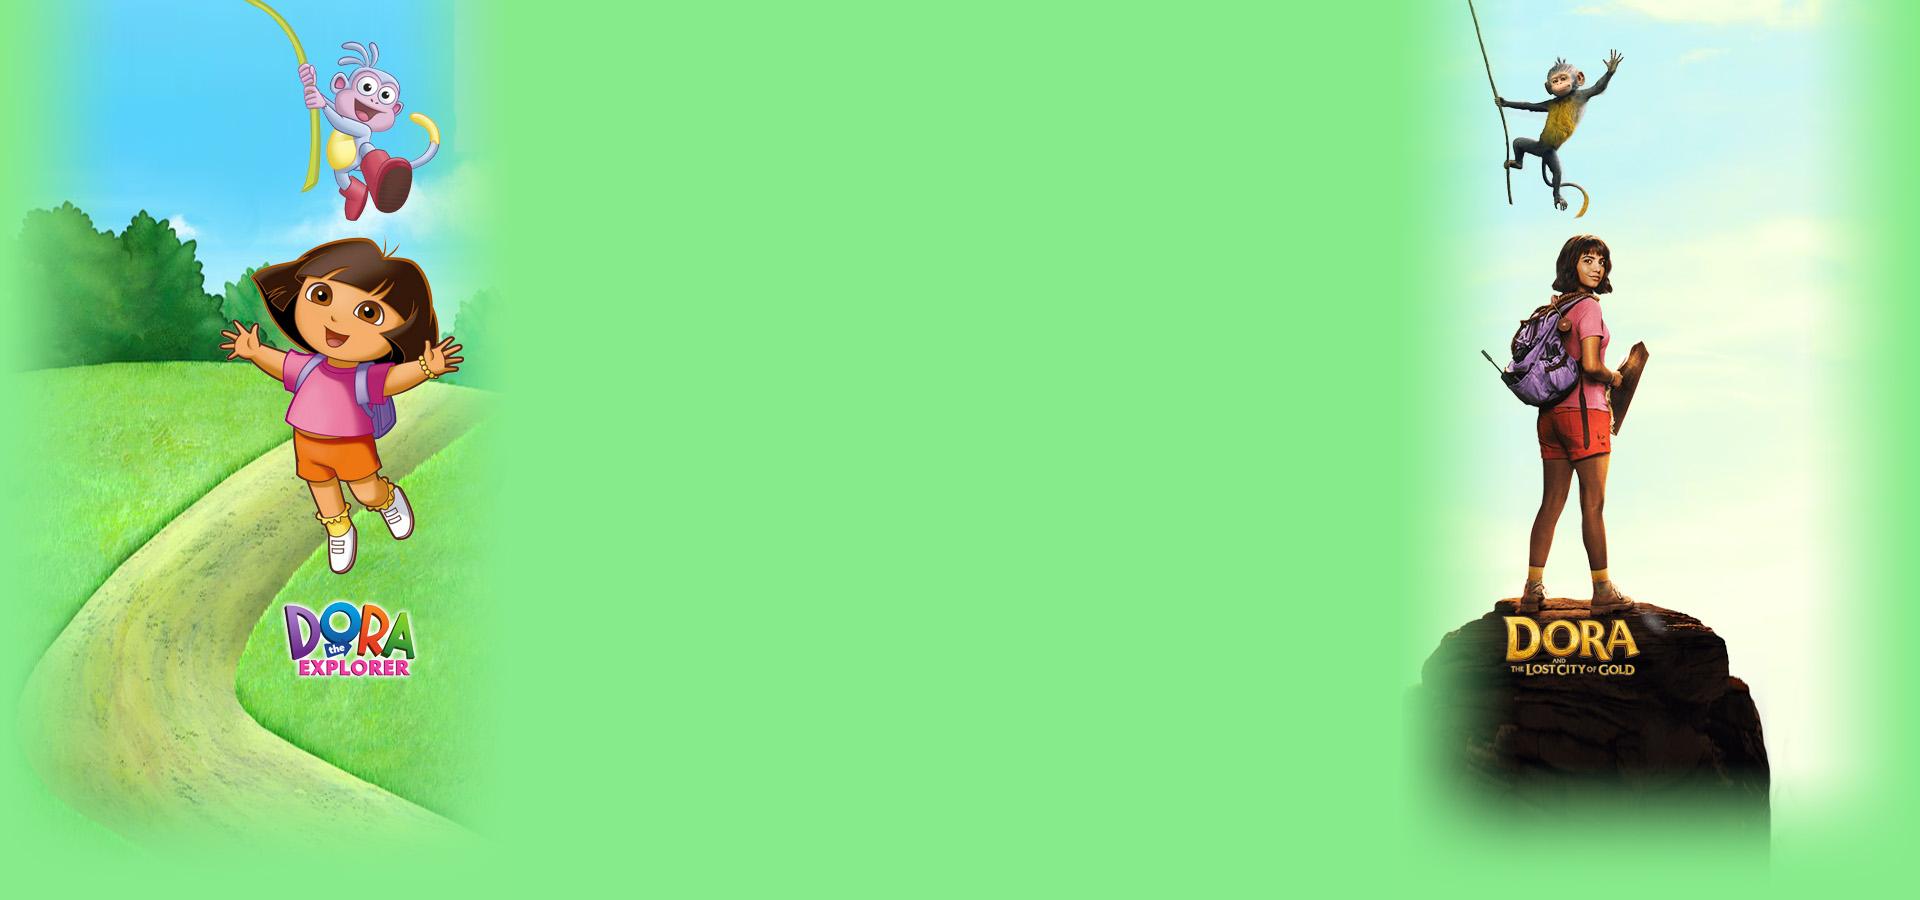 dora the explorer super map with File Wiki Background on 6318 as well Dora The Explorerdora Saves The Mermaids Go Diego Go Safari Adventure additionally Watch in addition File wiki Background further Dora The Explorer CATCH THE STARS VHS VIDEO 2151310.